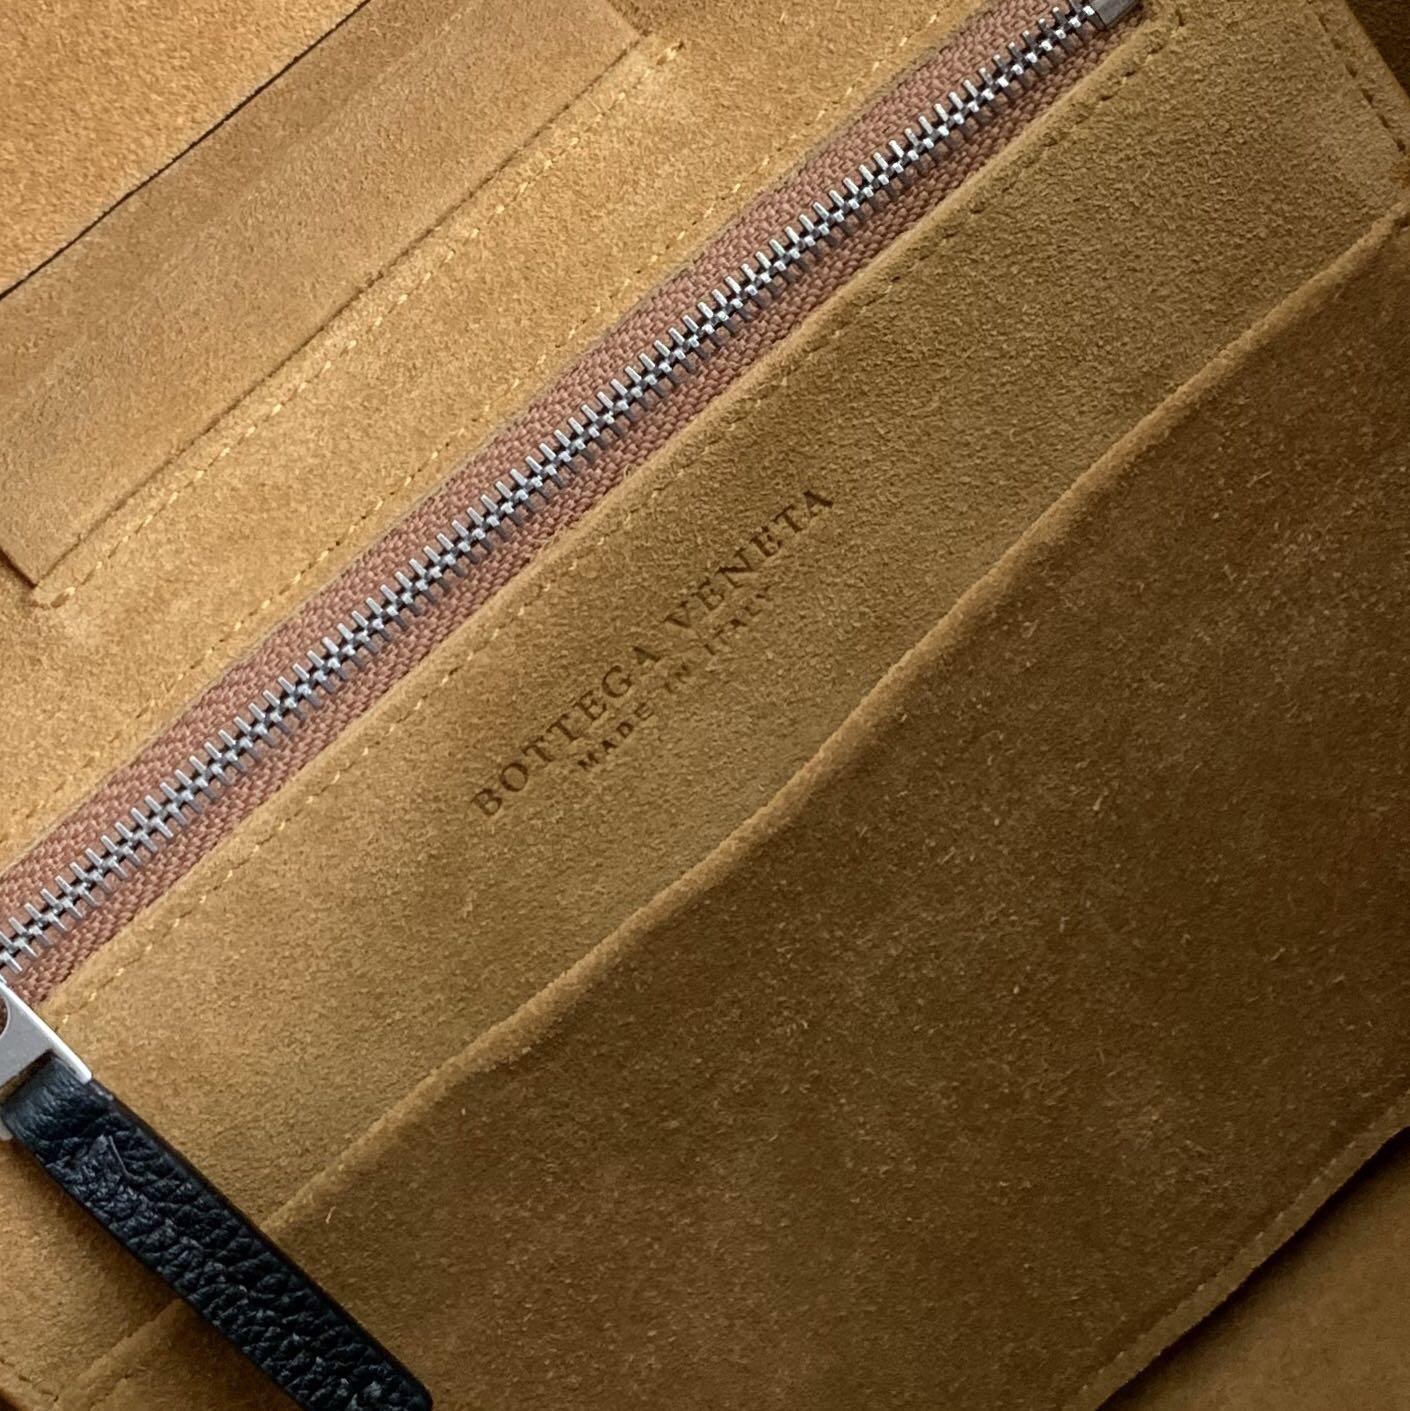 【P1730】Bv 小号Arco购物袋 575943 牛皮/荔枝纹 黑色 袋口33 底22宽6高22 (不含手柄)